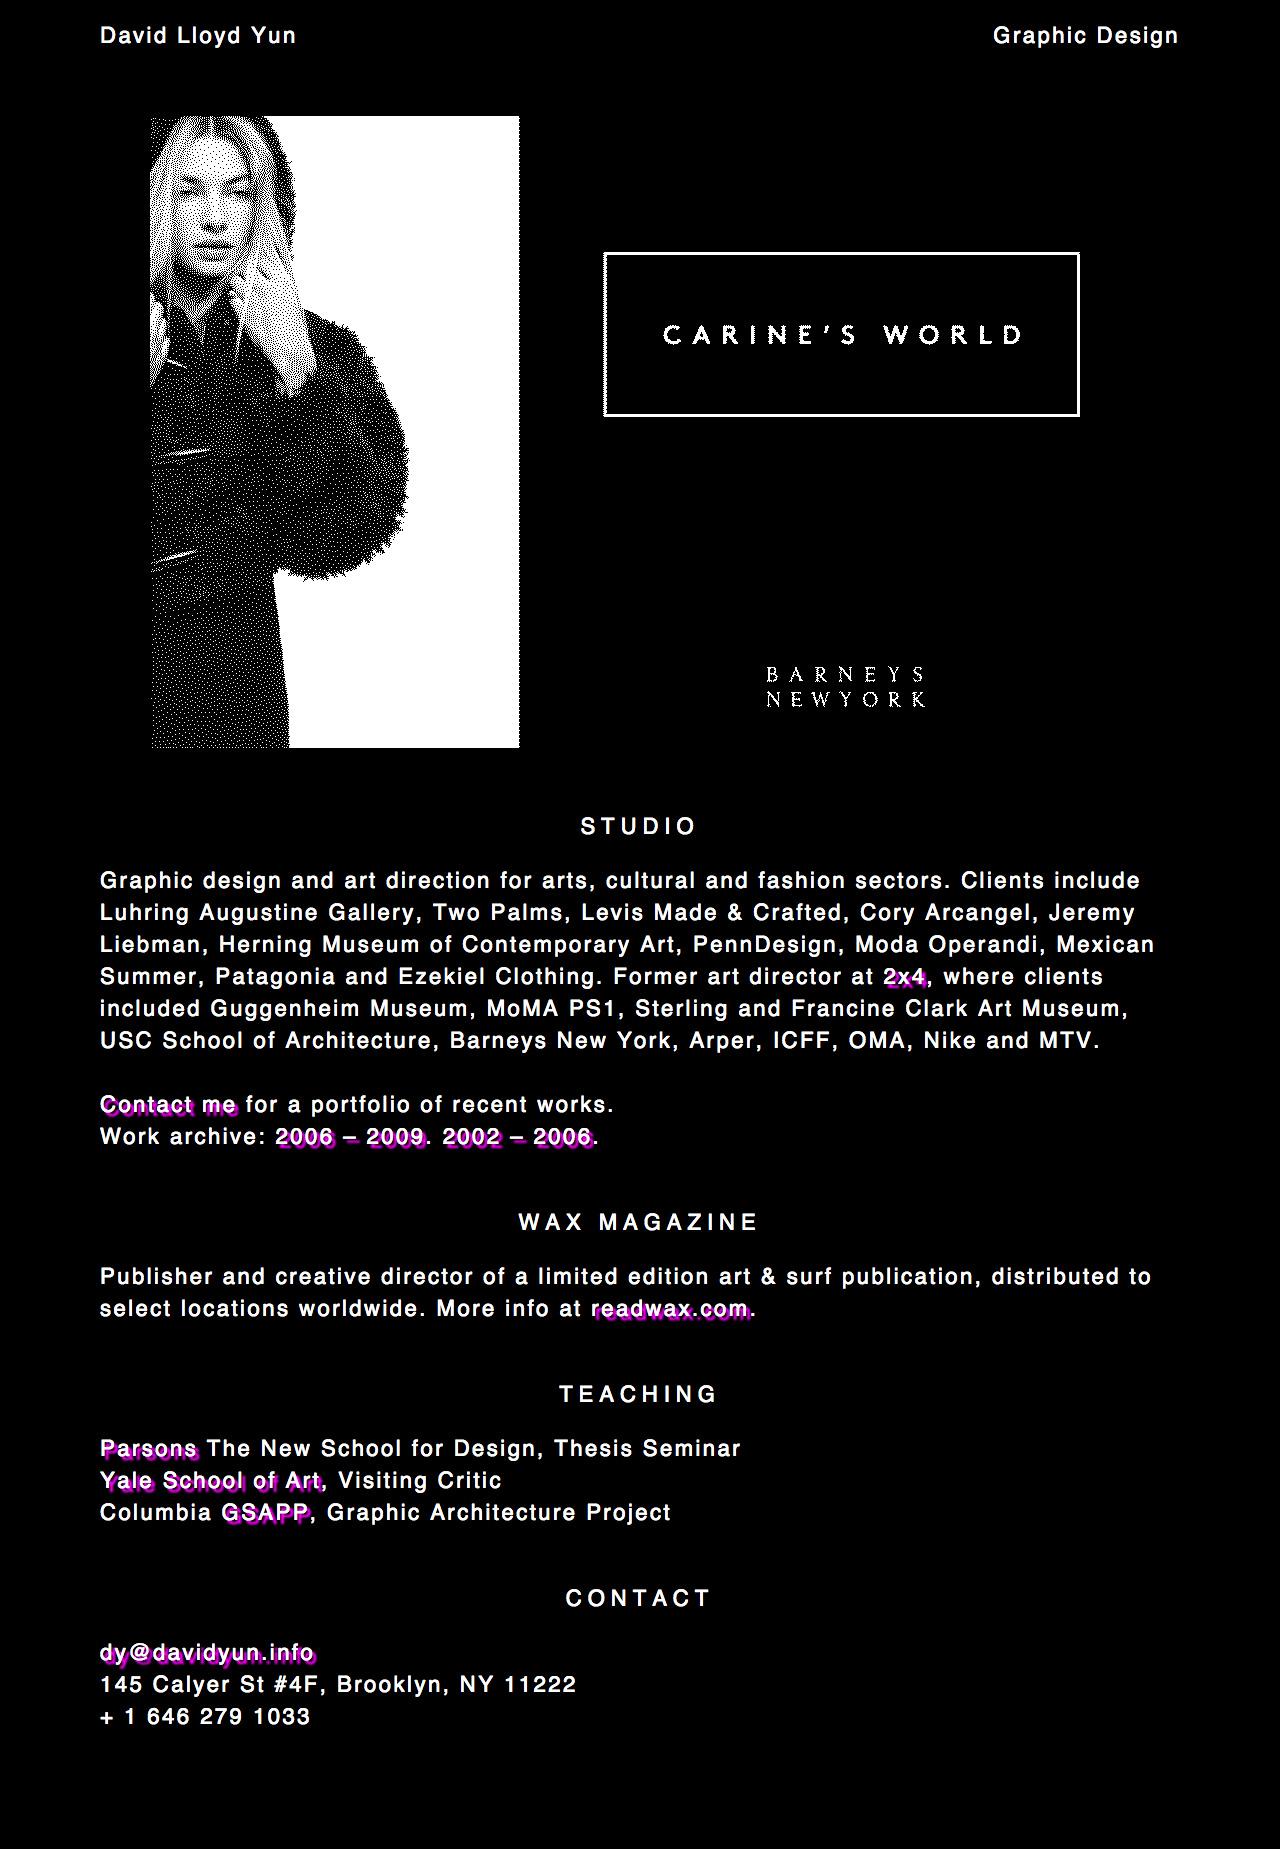 David Lloyd Yun Website Screenshot